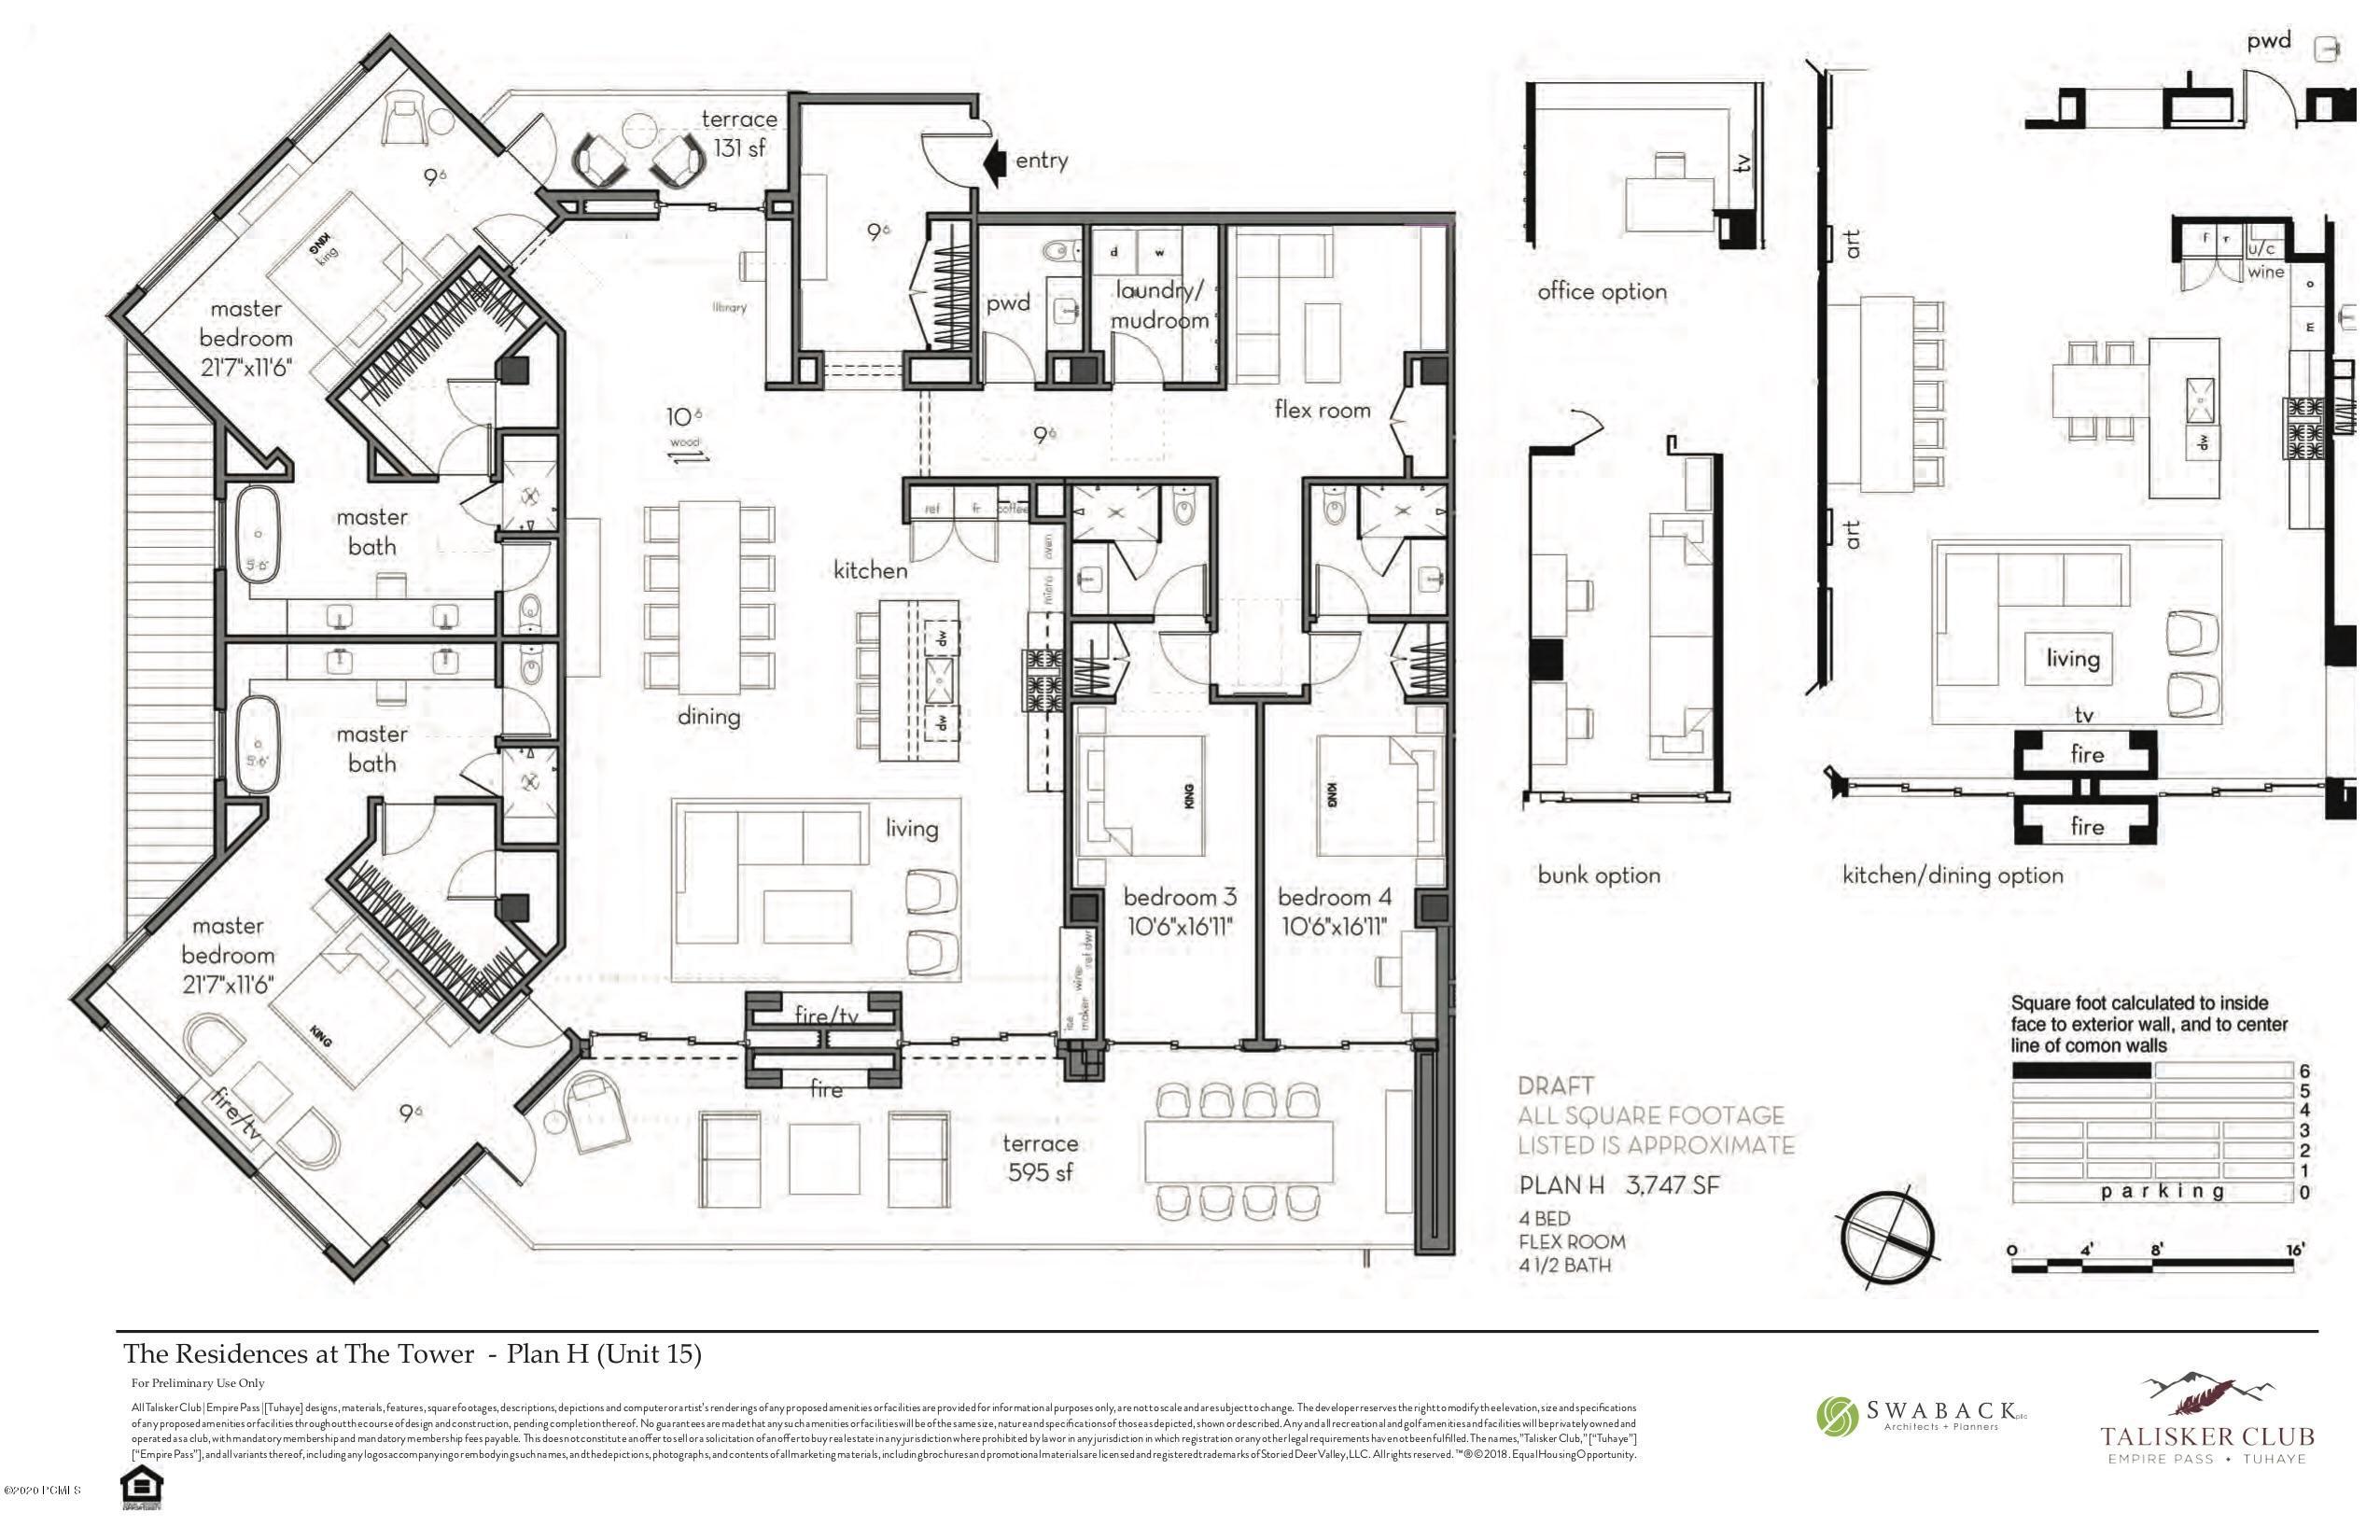 8680 Empire Club Drive, Park City, Utah 84060, 4 Bedrooms Bedrooms, ,5 BathroomsBathrooms,Condominium,For Sale,Empire Club Drive,11907637